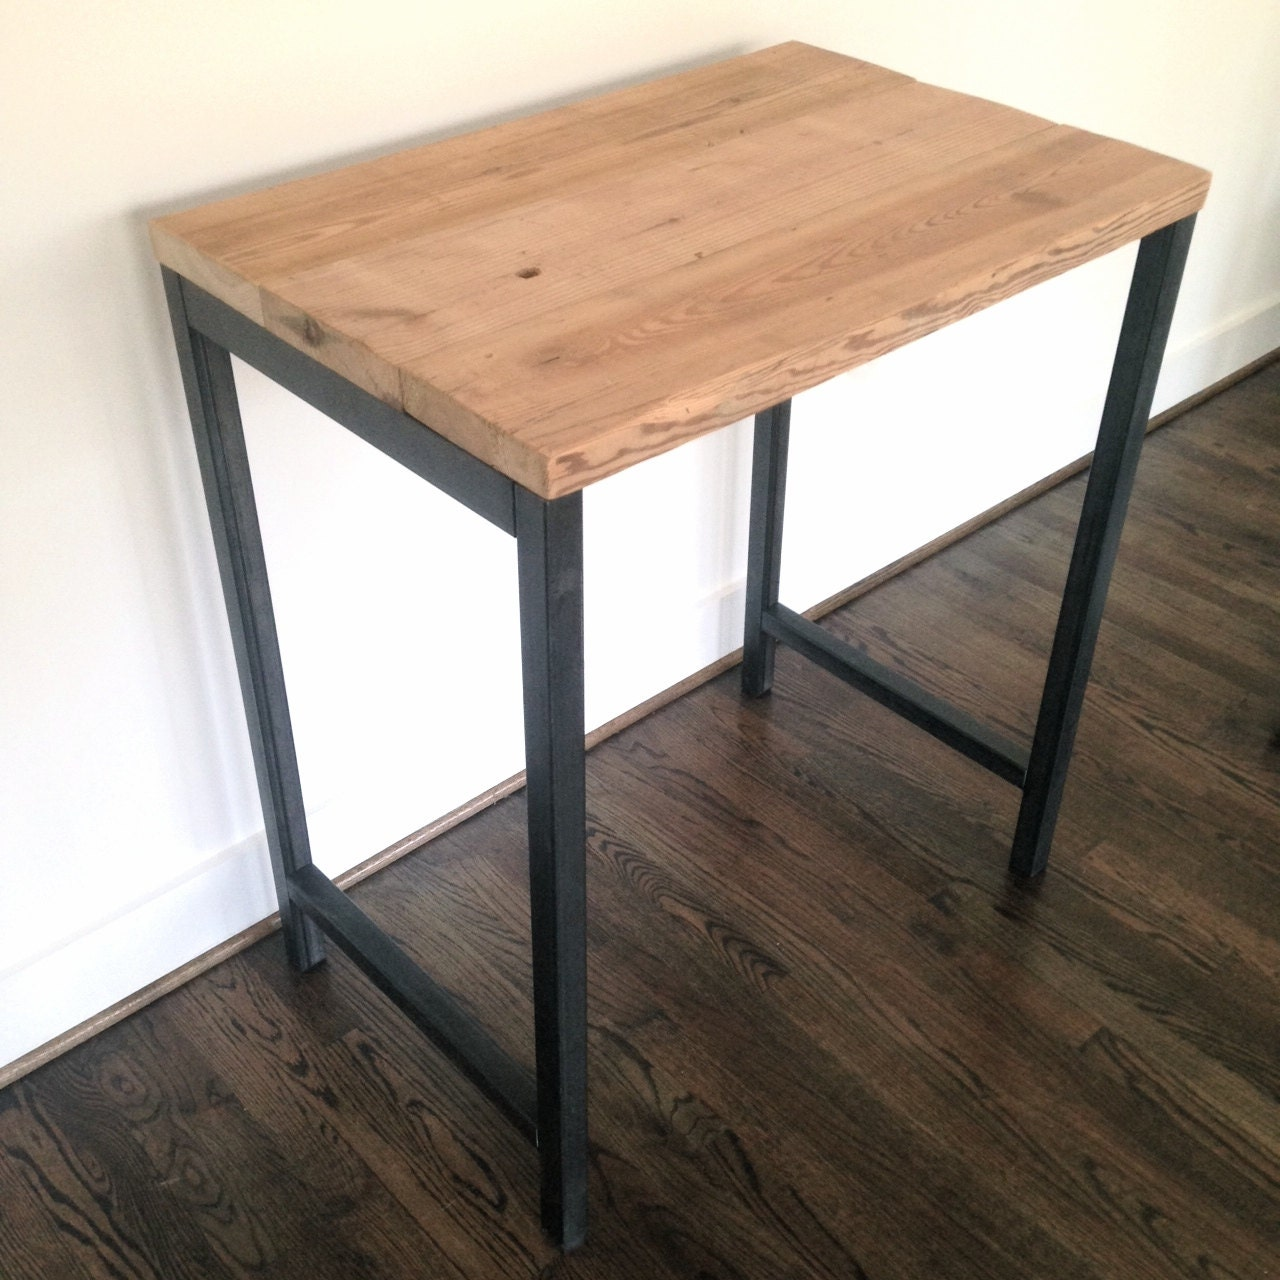 Luxury Antique Primitive Wood Standing Desk For Sale At 1stdibs - Book Of Woodworking Standing Desk In Us By Liam Egorlin.com